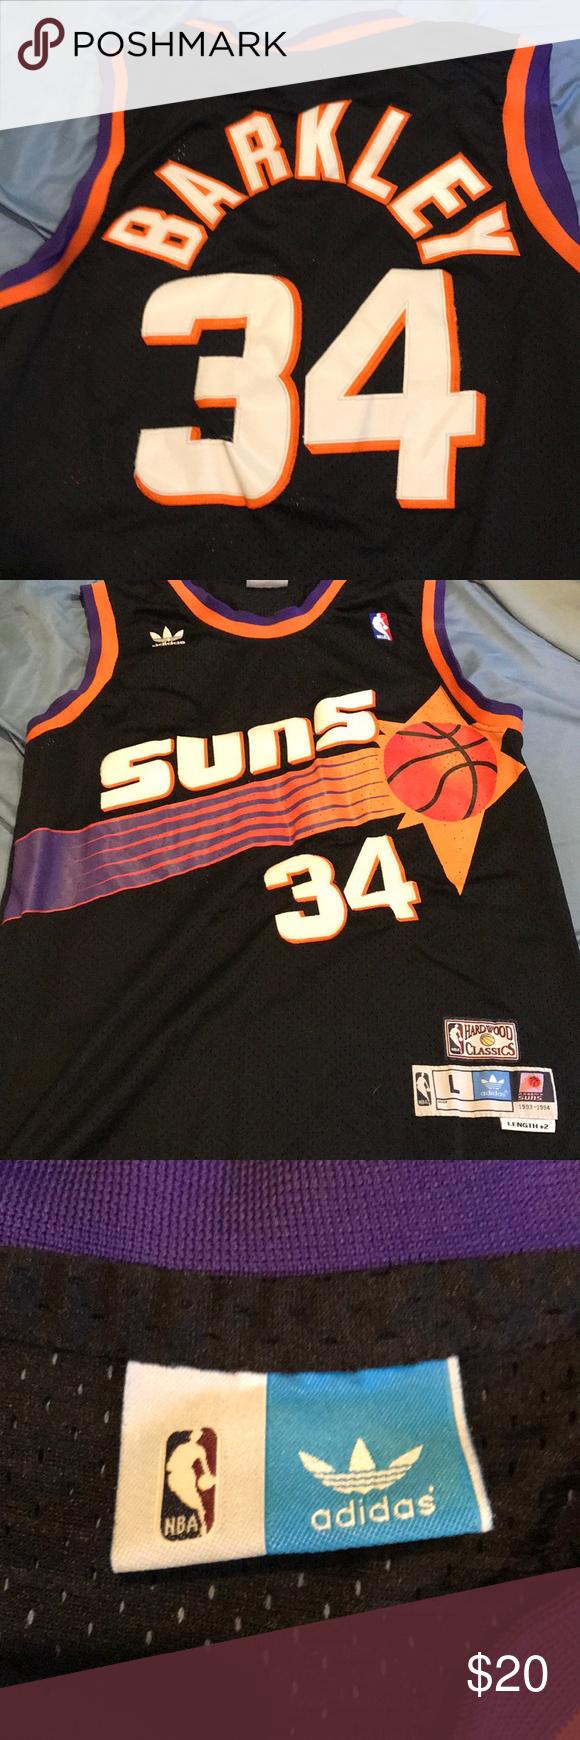 Charles Barkley Suns Jersey Charles Barkley Jersey Black Adidas